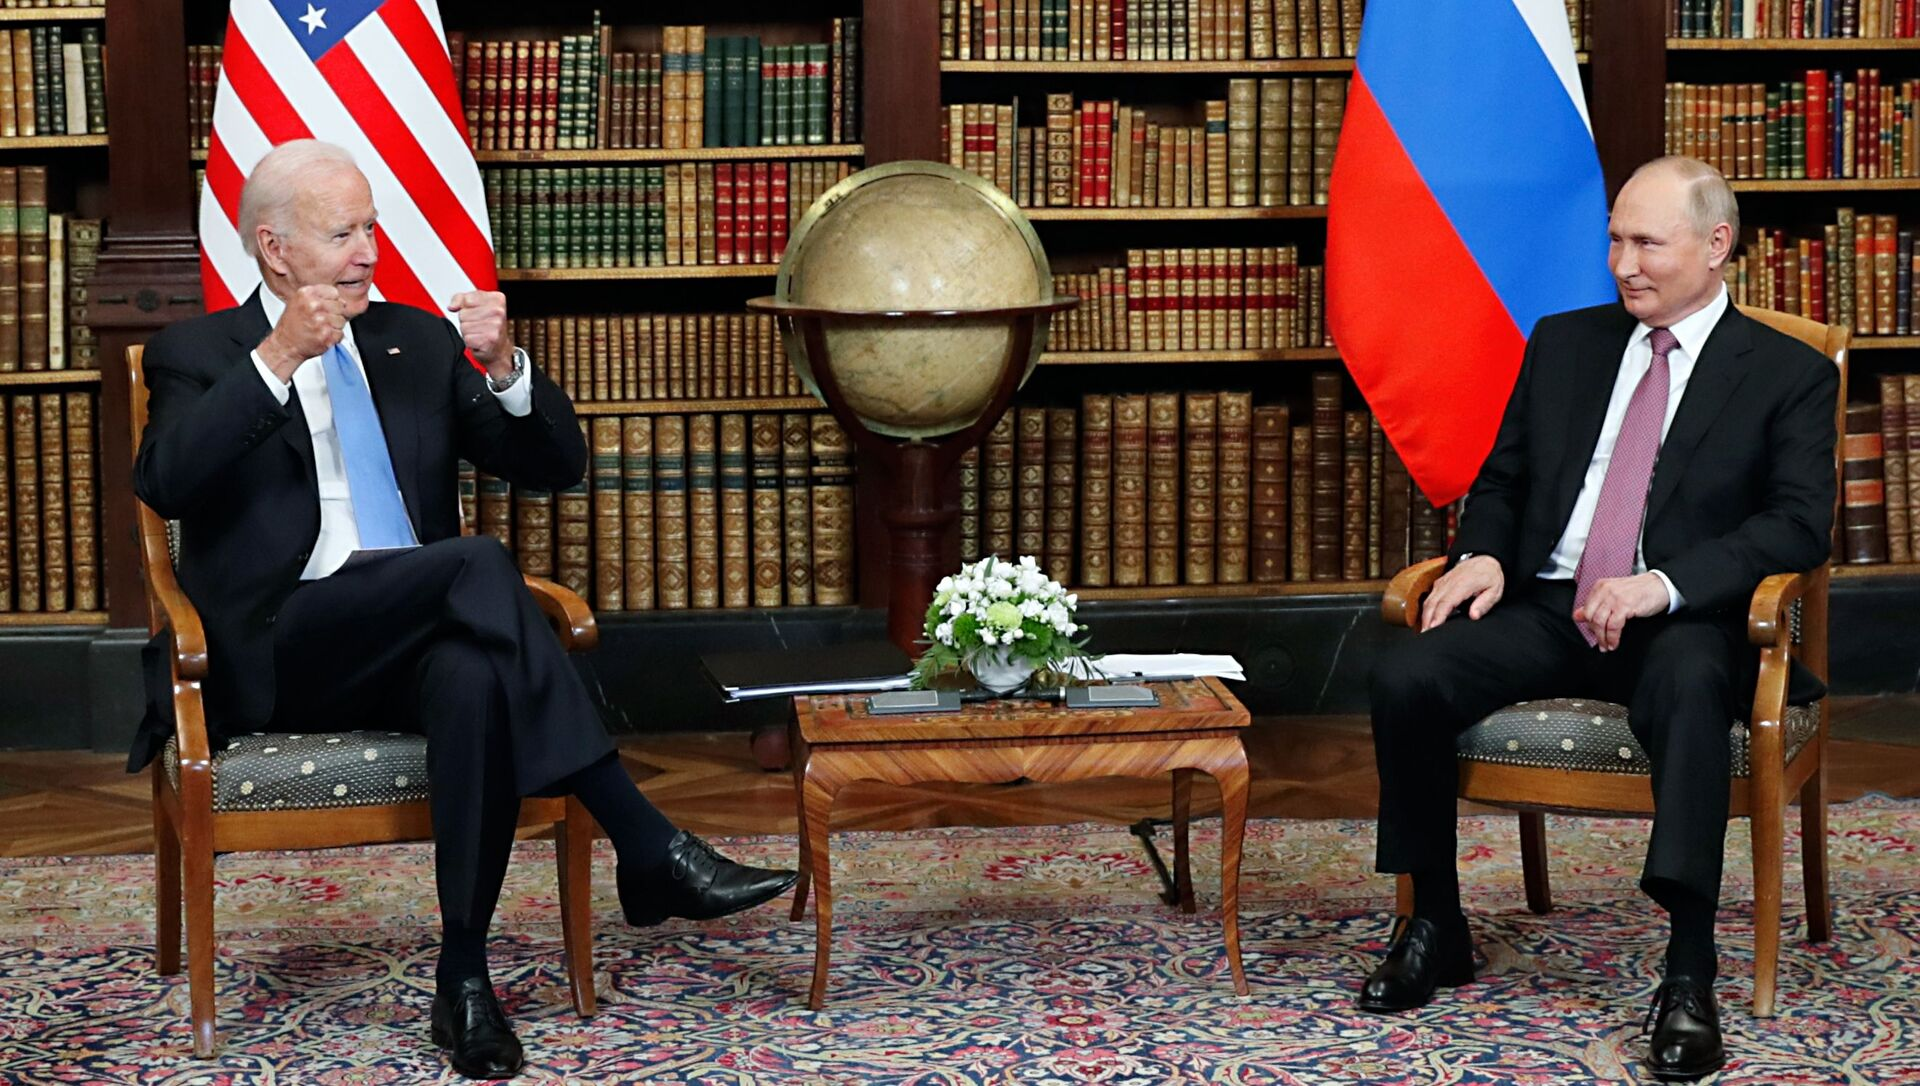 Президент РФ Владимир Путин и президент США Джо Байден  во время встречи в Женеве на вилле Ла Гранж - Sputnik Грузия, 1920, 28.07.2021